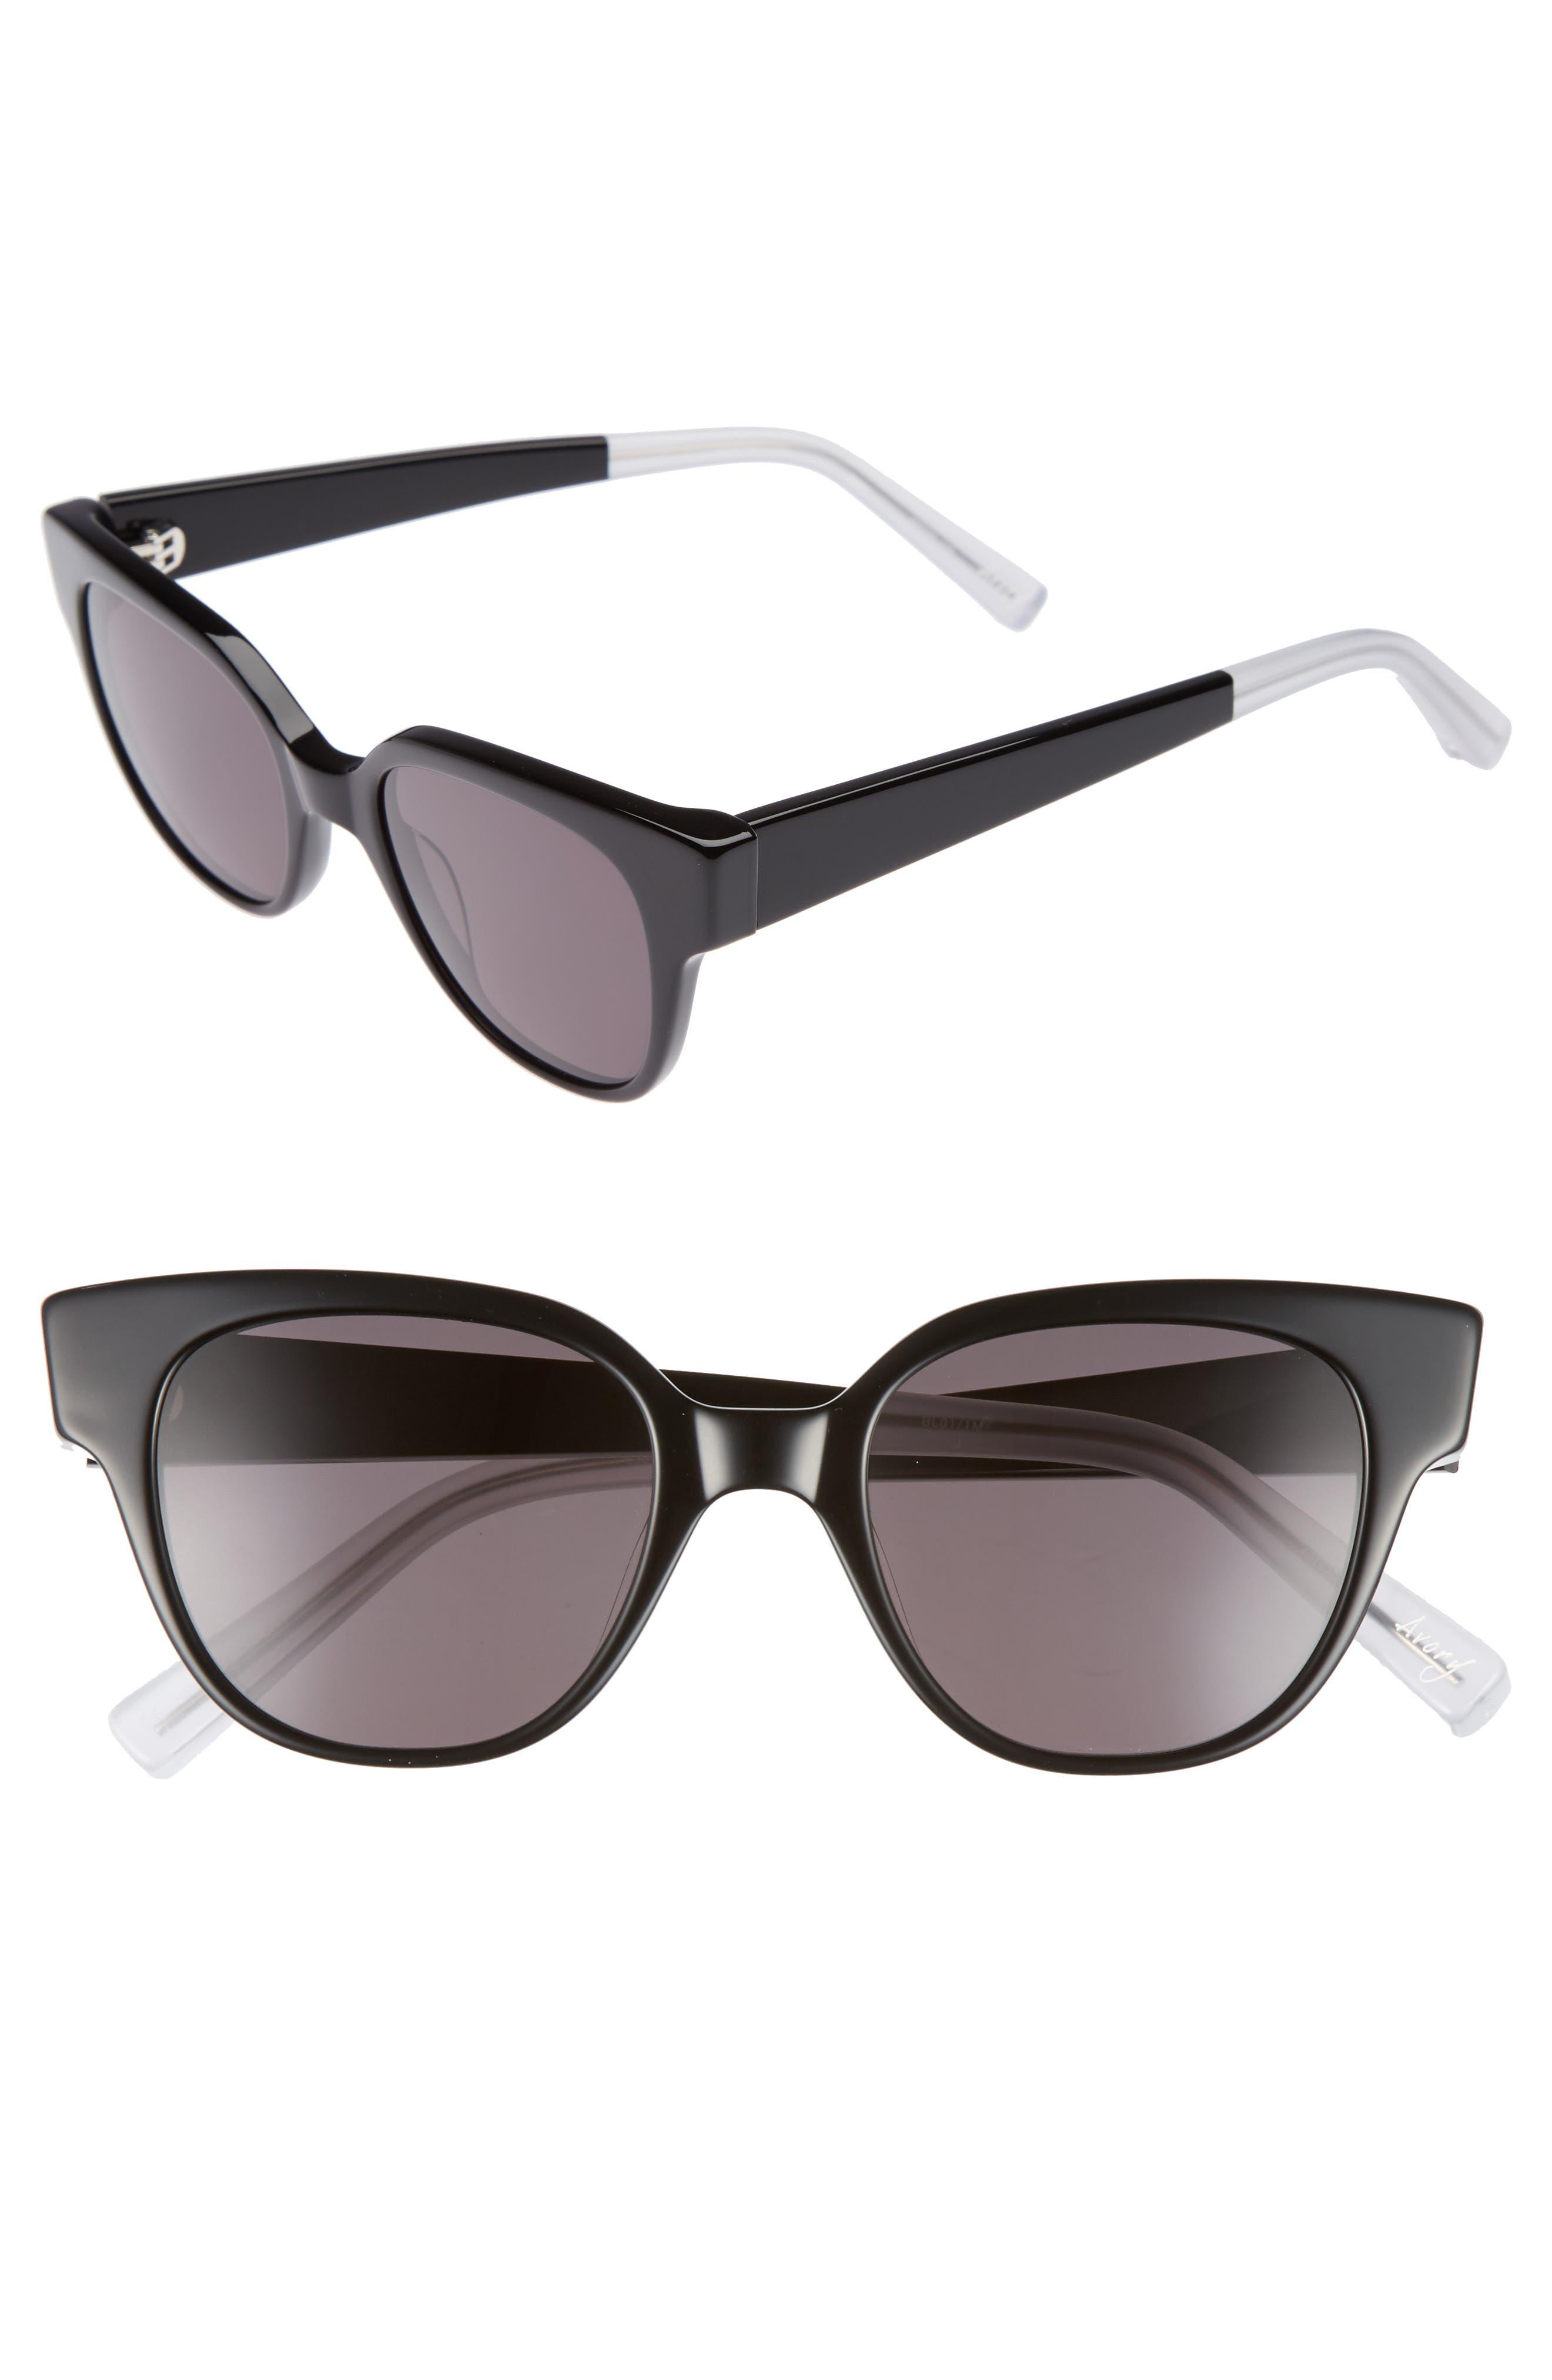 Avory 49mm Cat Eye Sunglasses,                         Main,                         color, 001